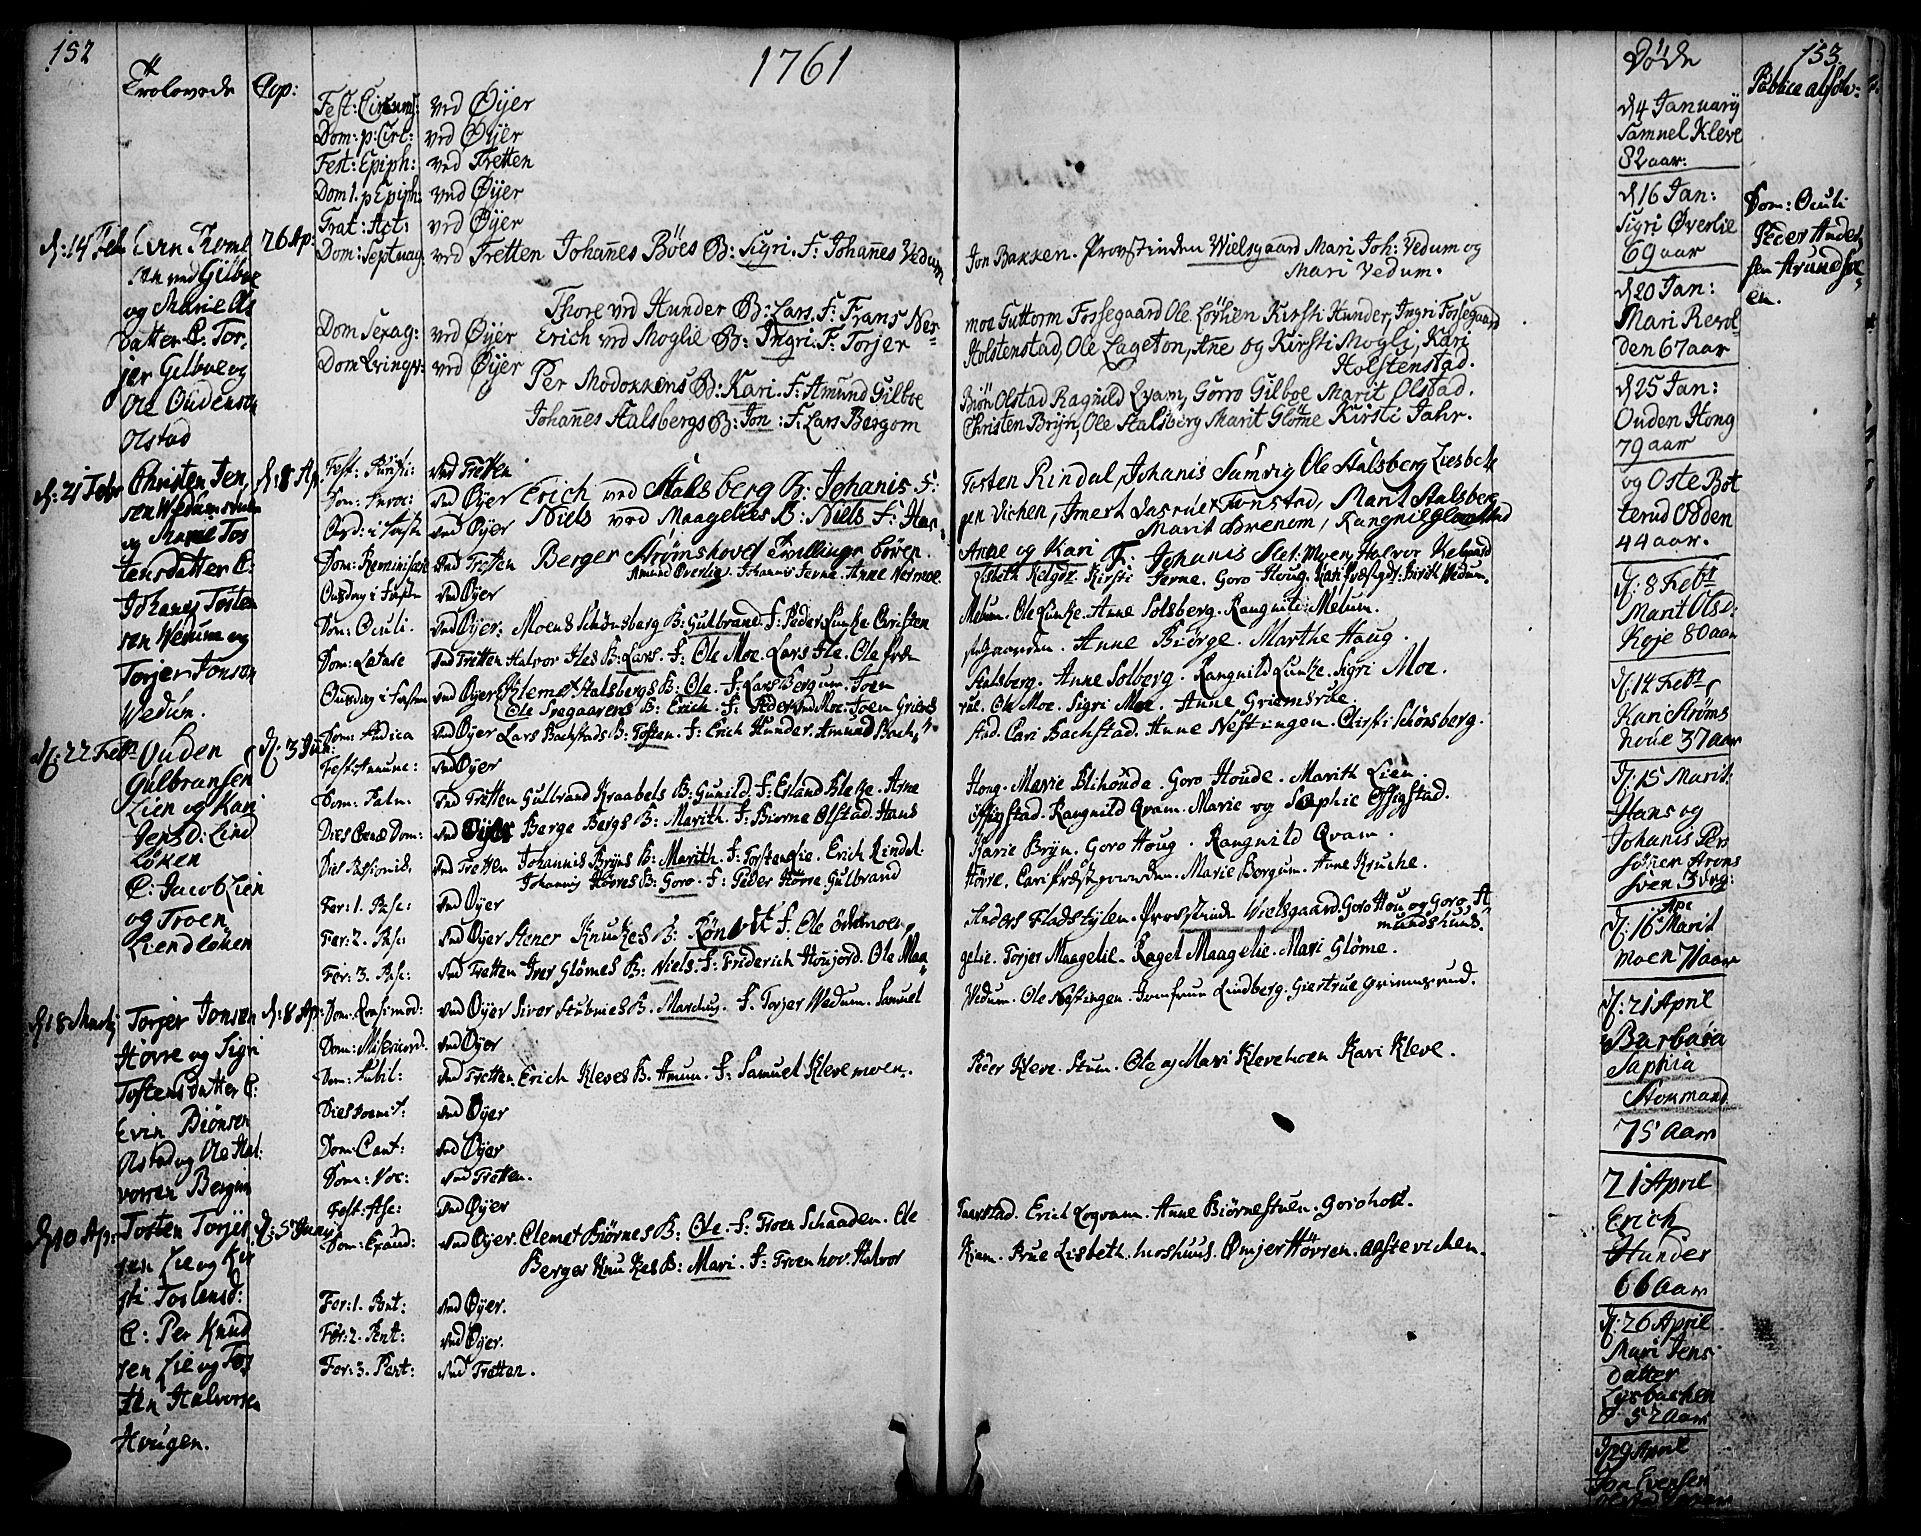 SAH, Øyer prestekontor, Ministerialbok nr. 2, 1733-1784, s. 152-153